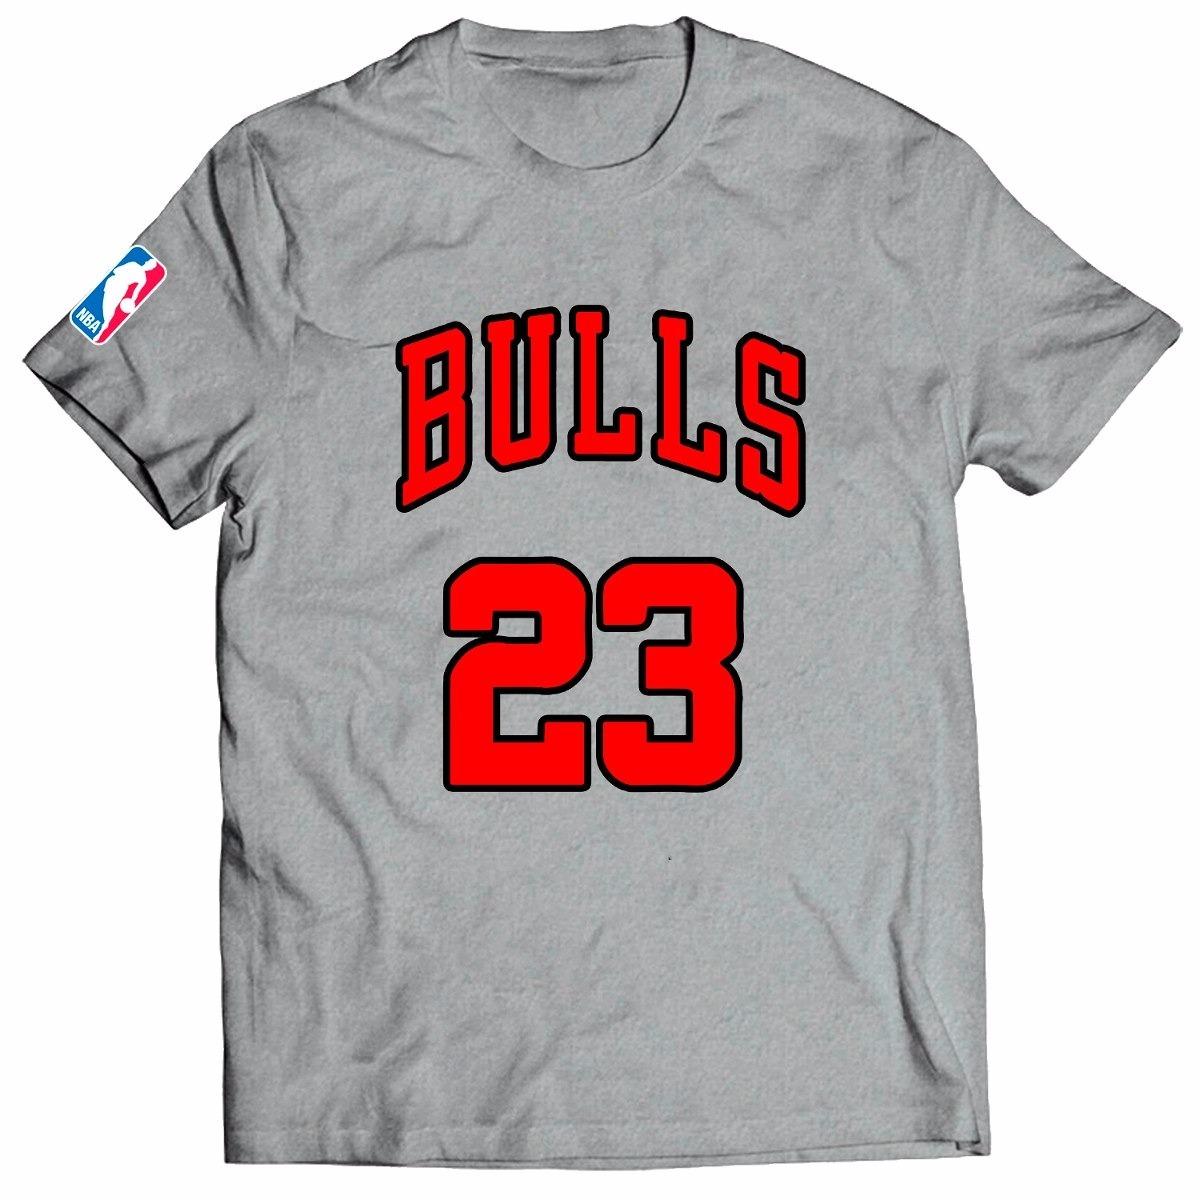 e1307fb07 camisa camiseta basquete time bulls basquetebol jordan. Carregando zoom.